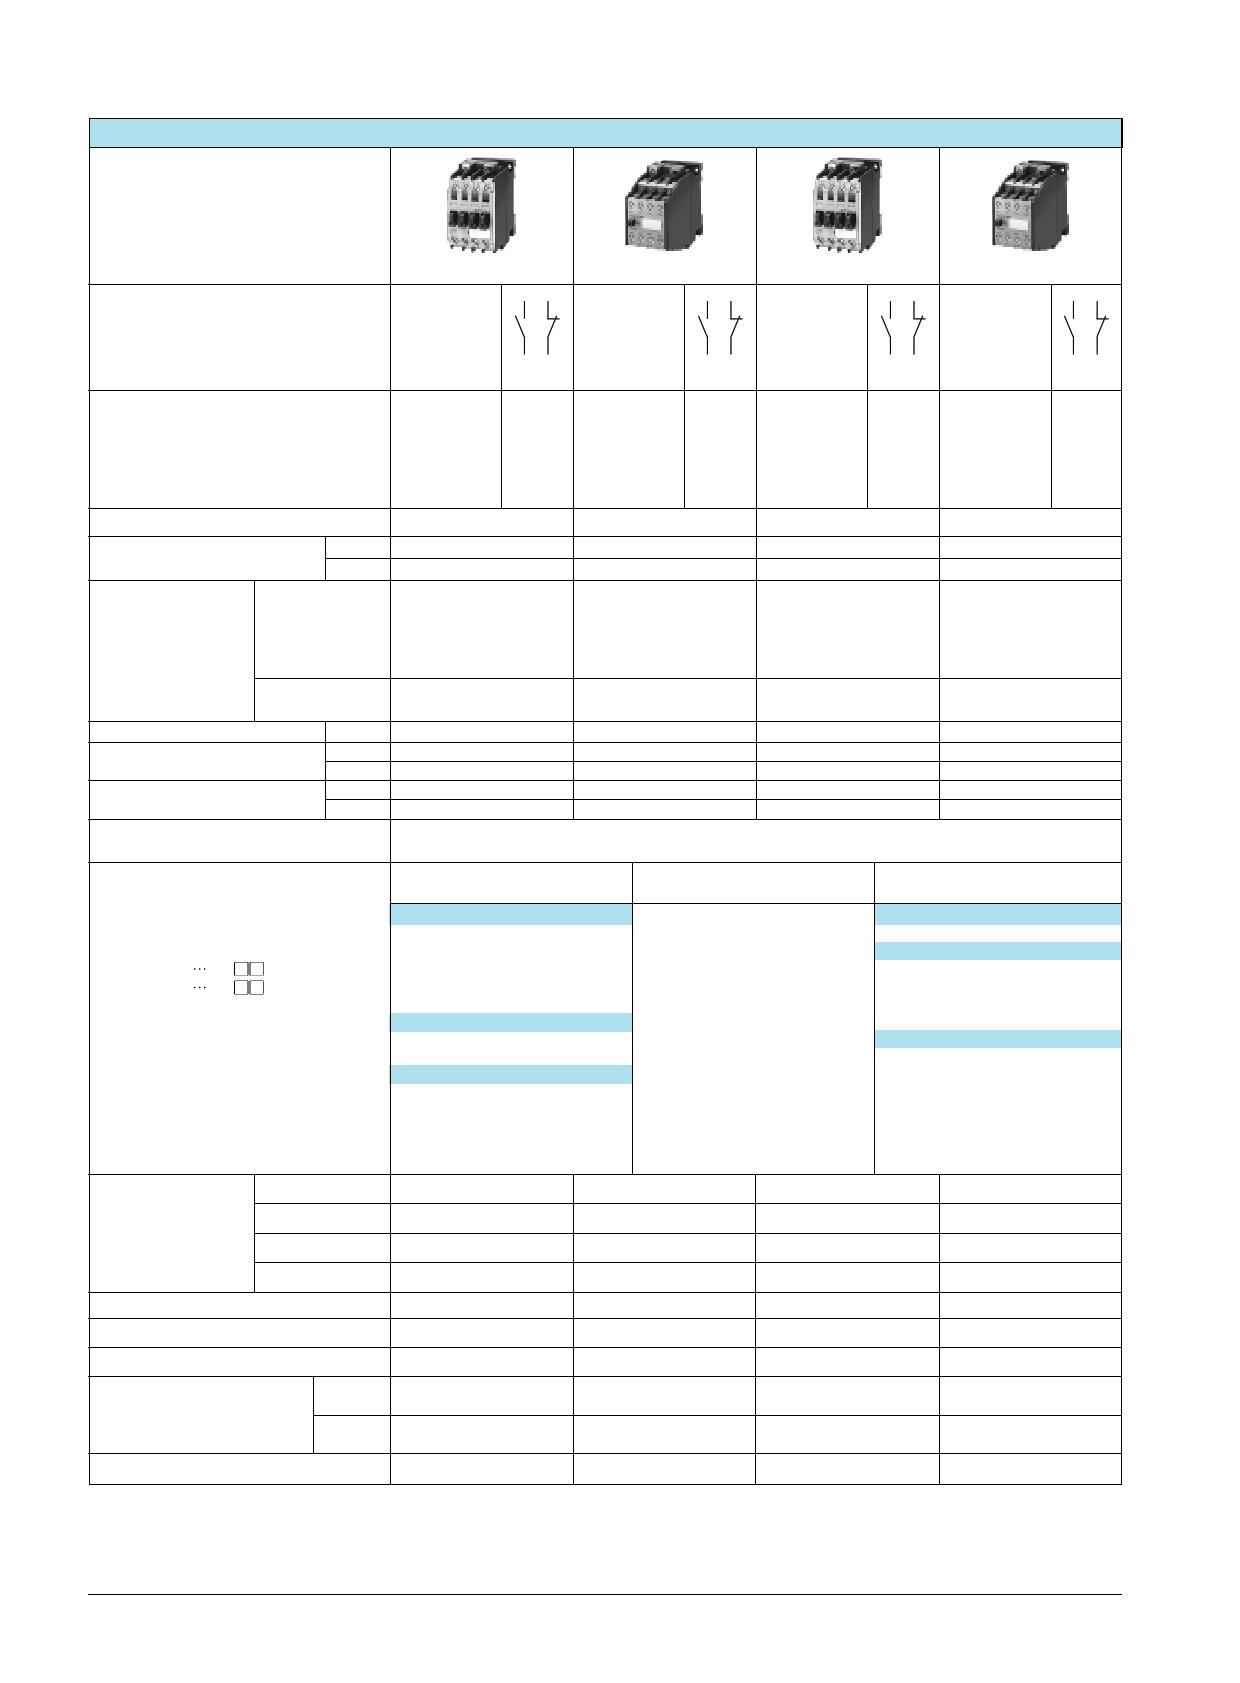 3TF54 Datasheet, 3TF54 PDF,ピン配置, 機能